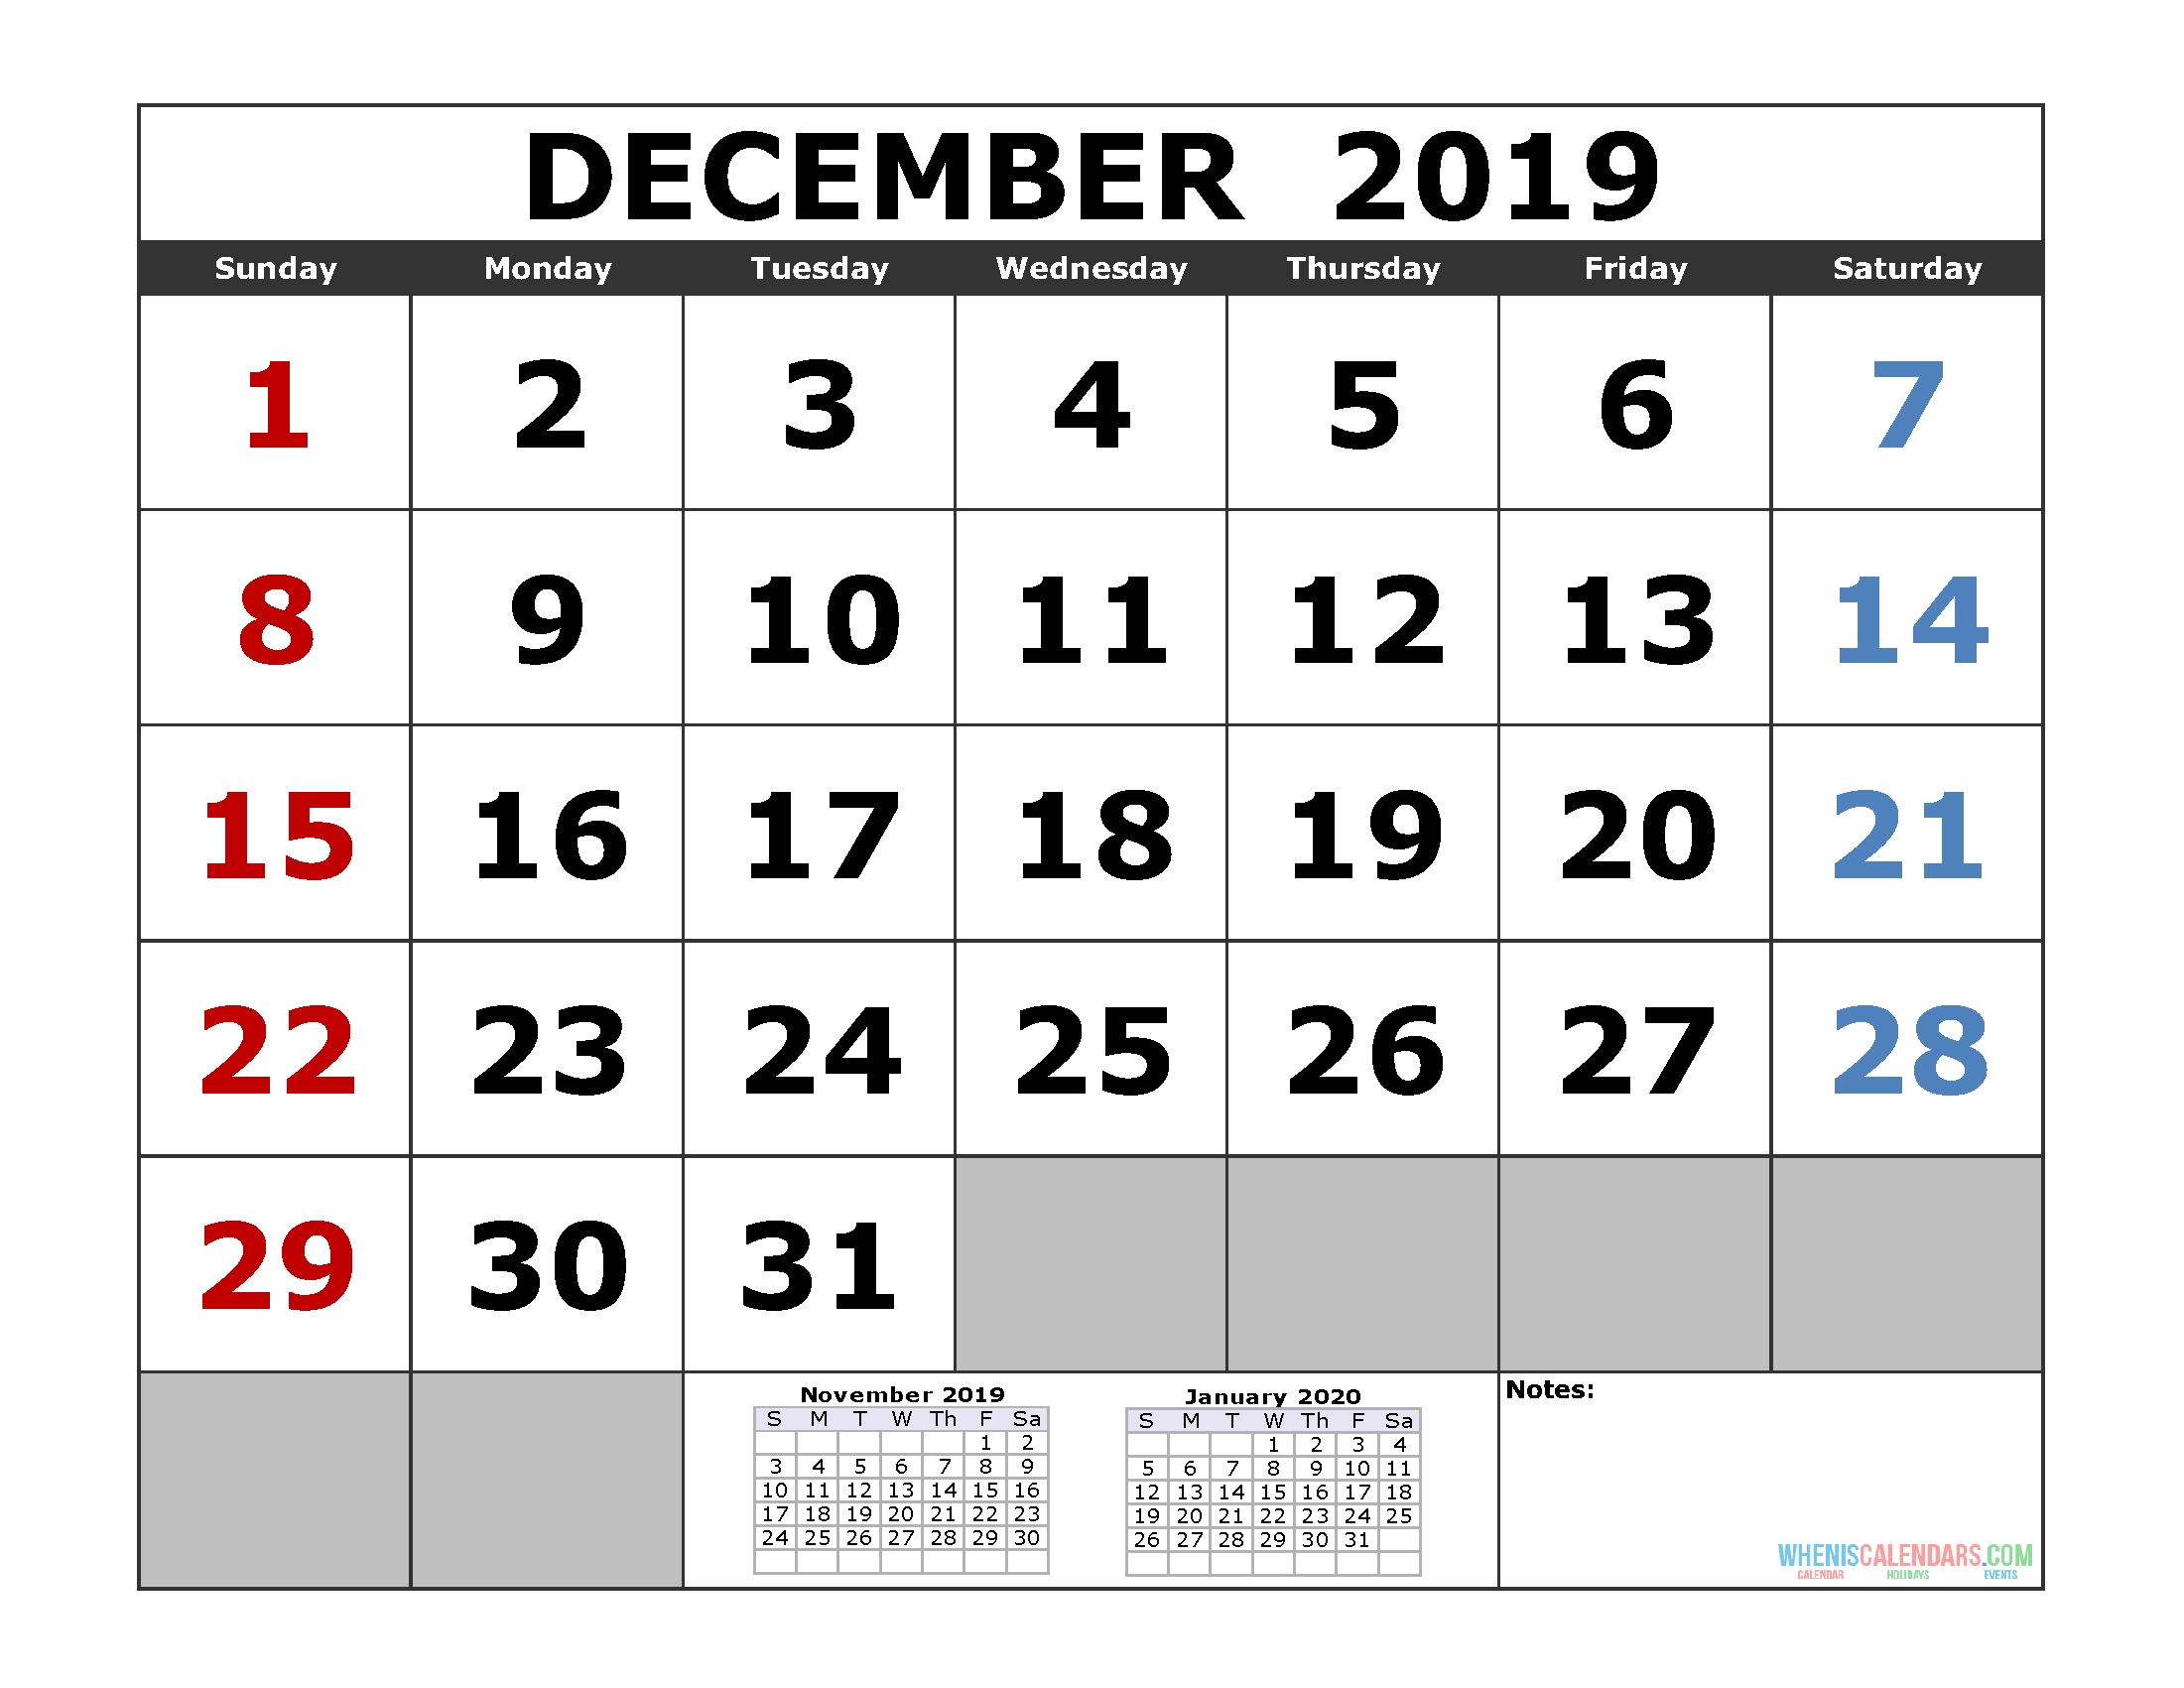 December 2019 Printable Calendar Template (3 Month Calendar-2 Monthly Printable Calender